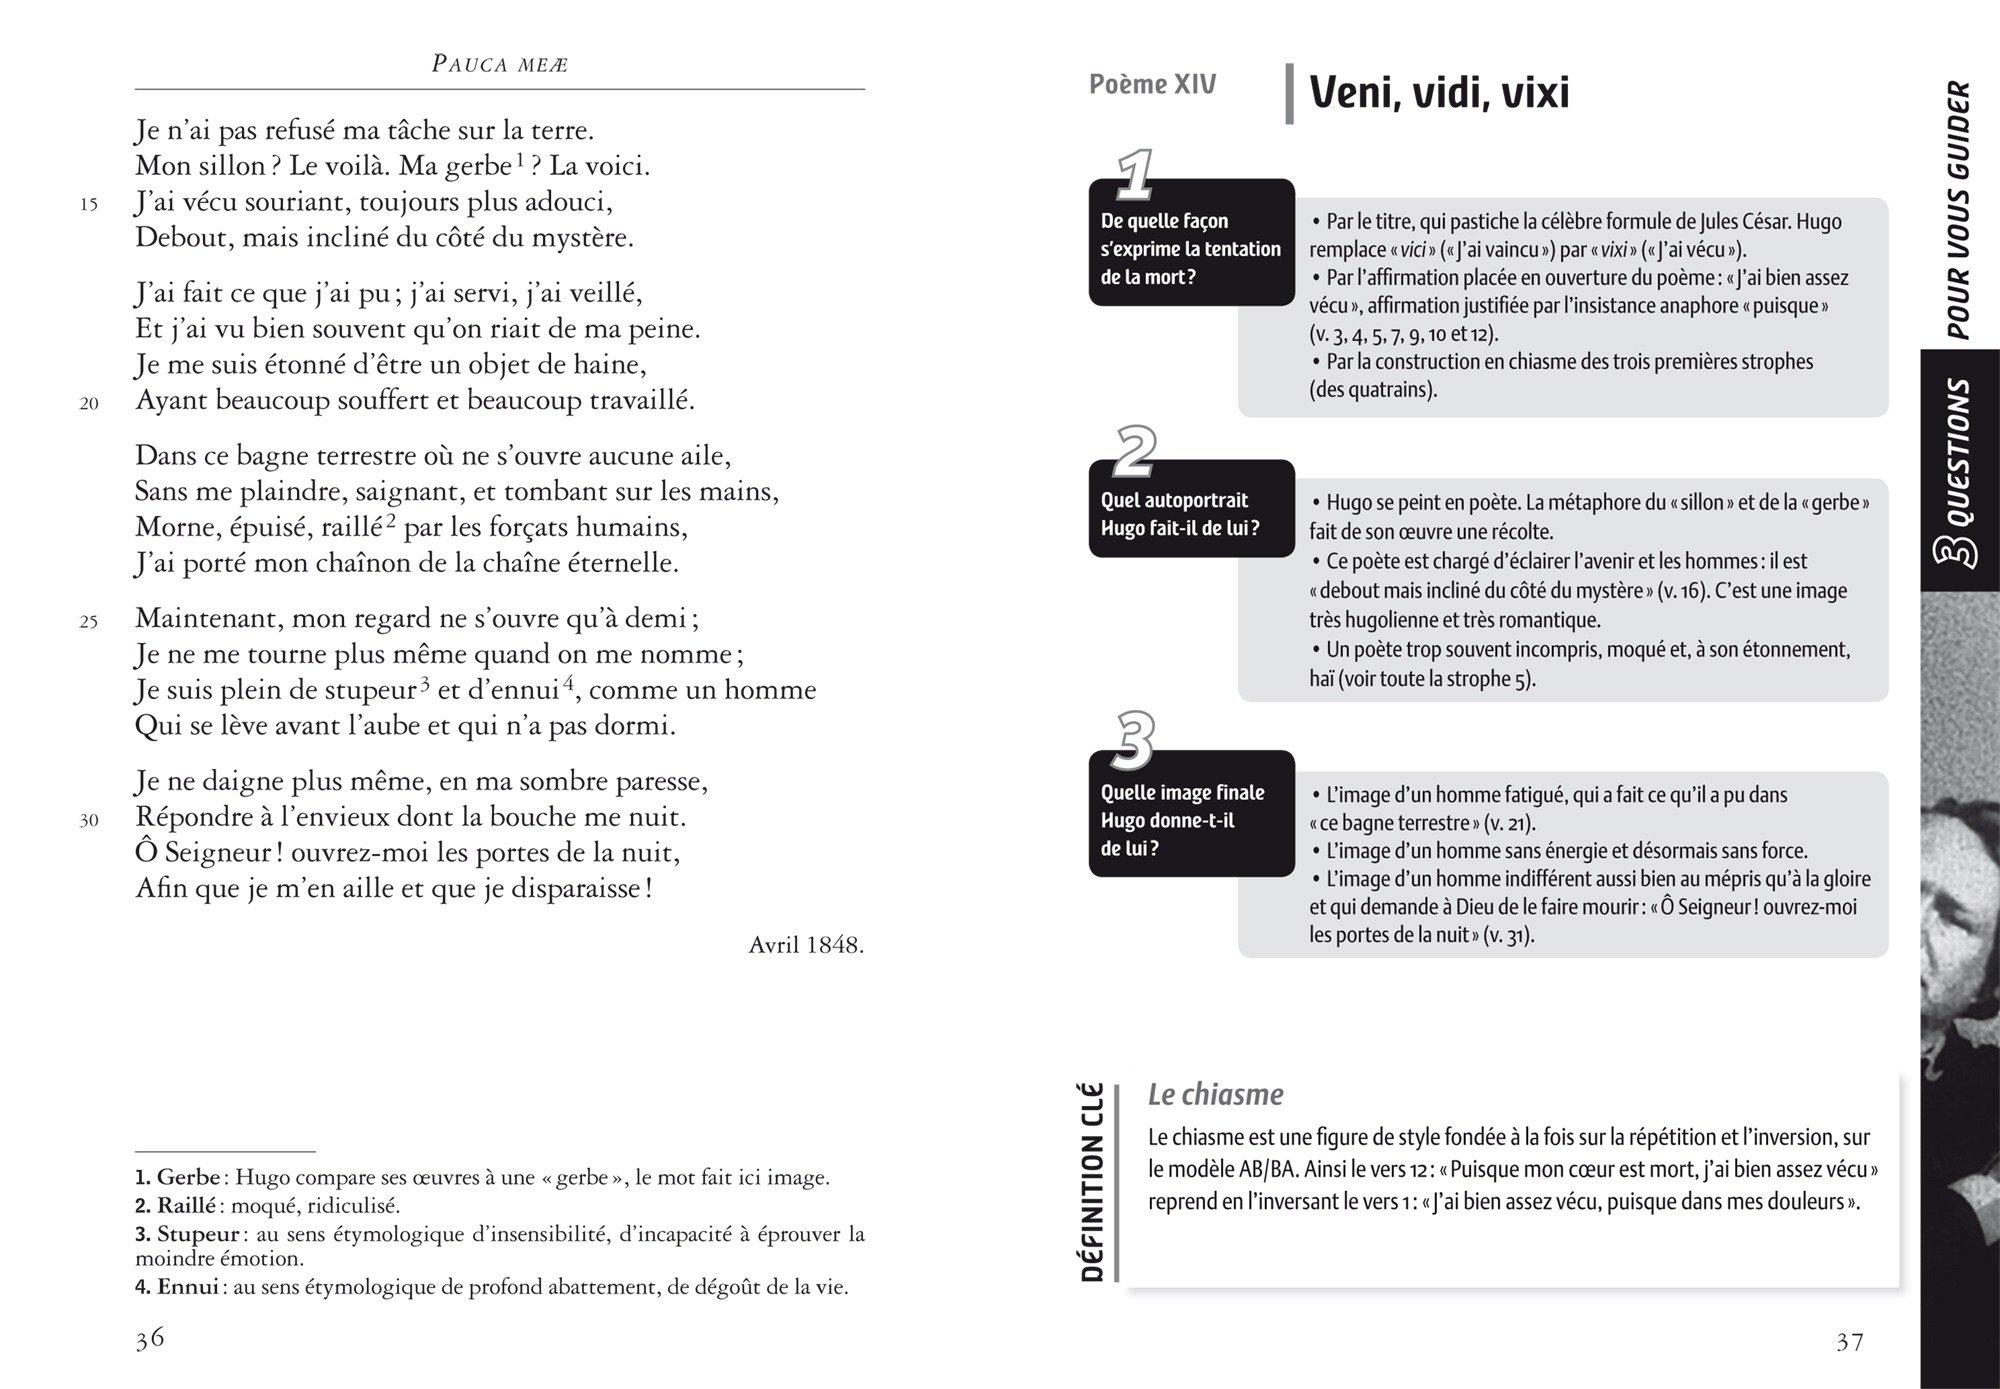 poeme 6 pauca meae